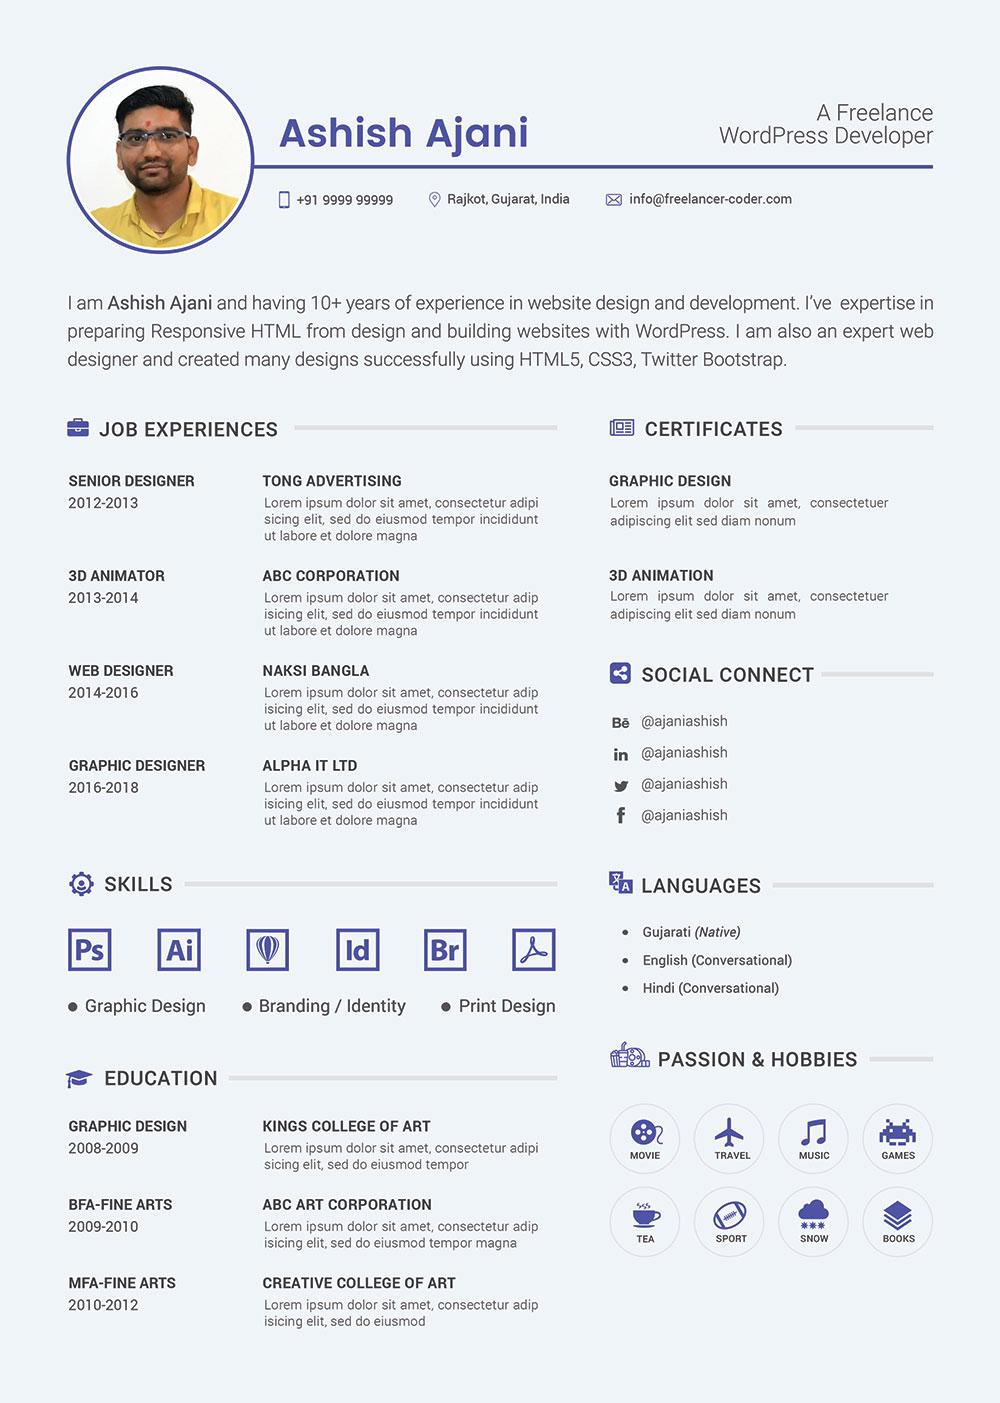 Free-PSD-Resume-Template-&-Cover-Letter-for-PHP-&-Wordpress-Developer-1